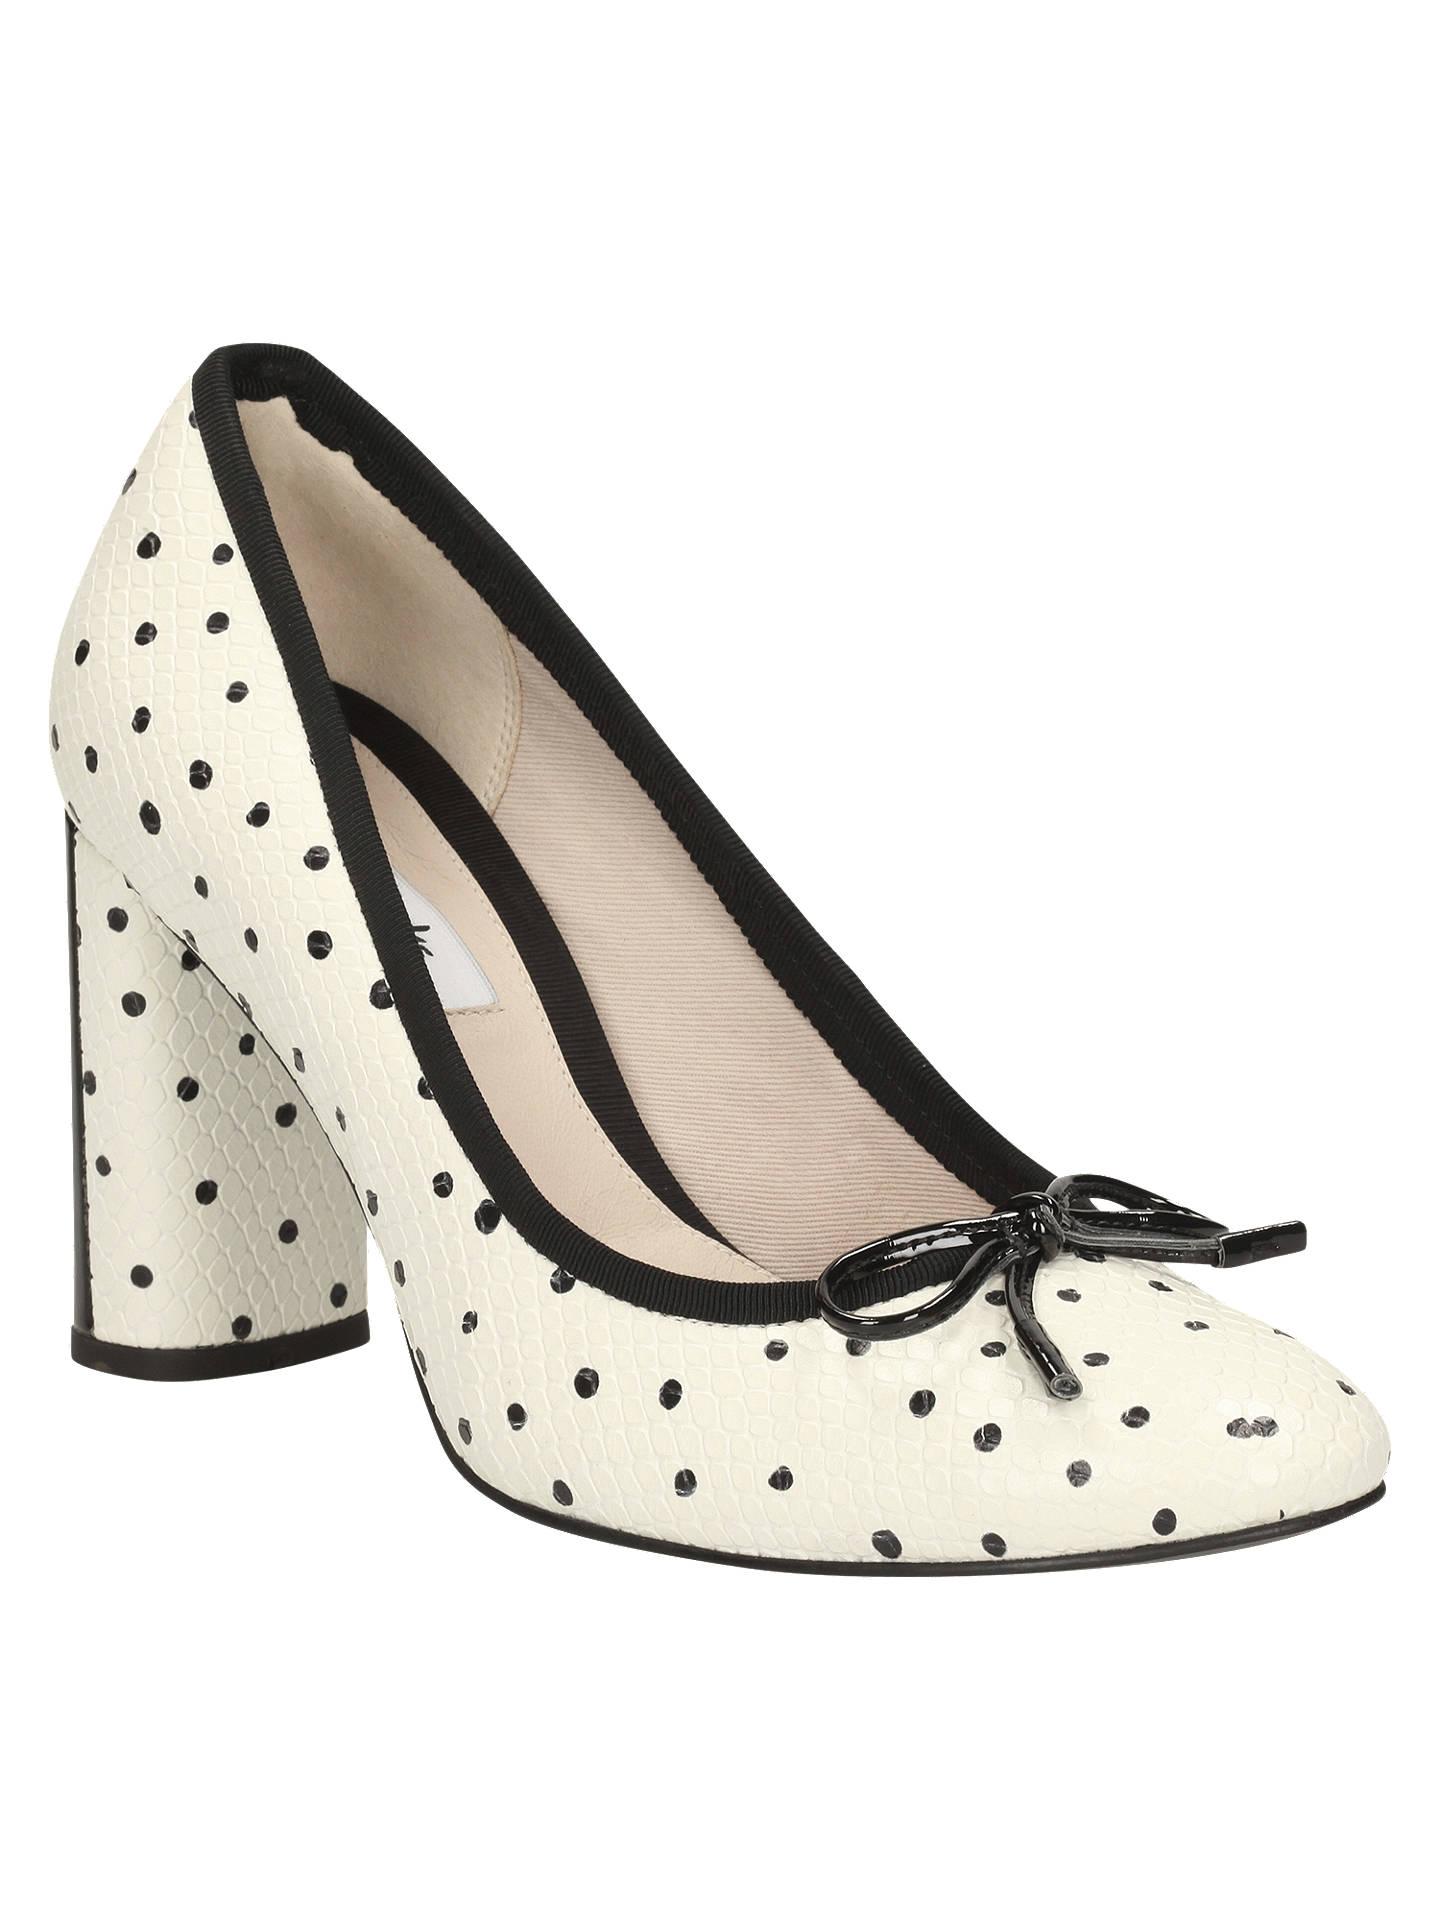 7221d0c654da Clarks Idamarie Faye Block Heeled Court Shoes at John Lewis   Partners